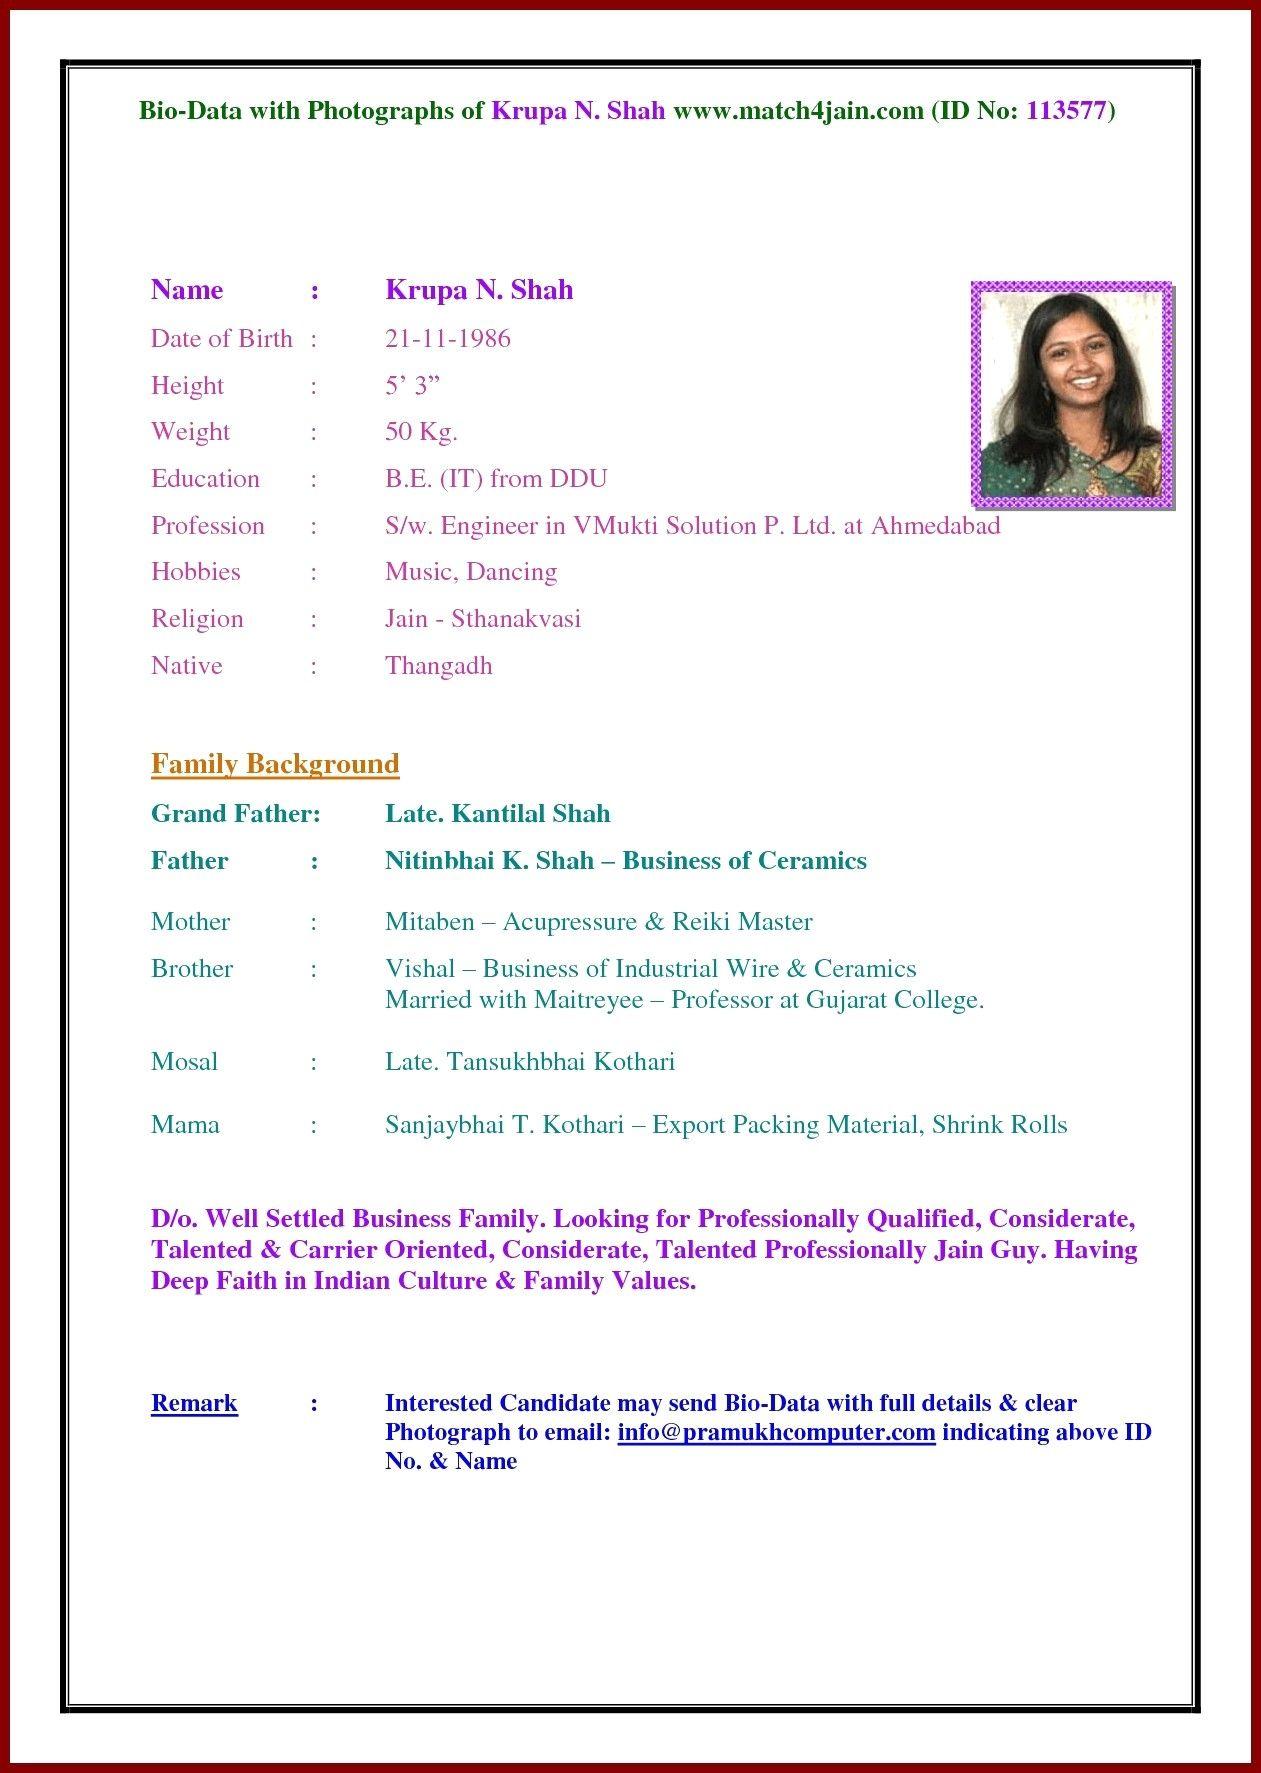 Muslim matrimonial resume esl letter ghostwriters services for school